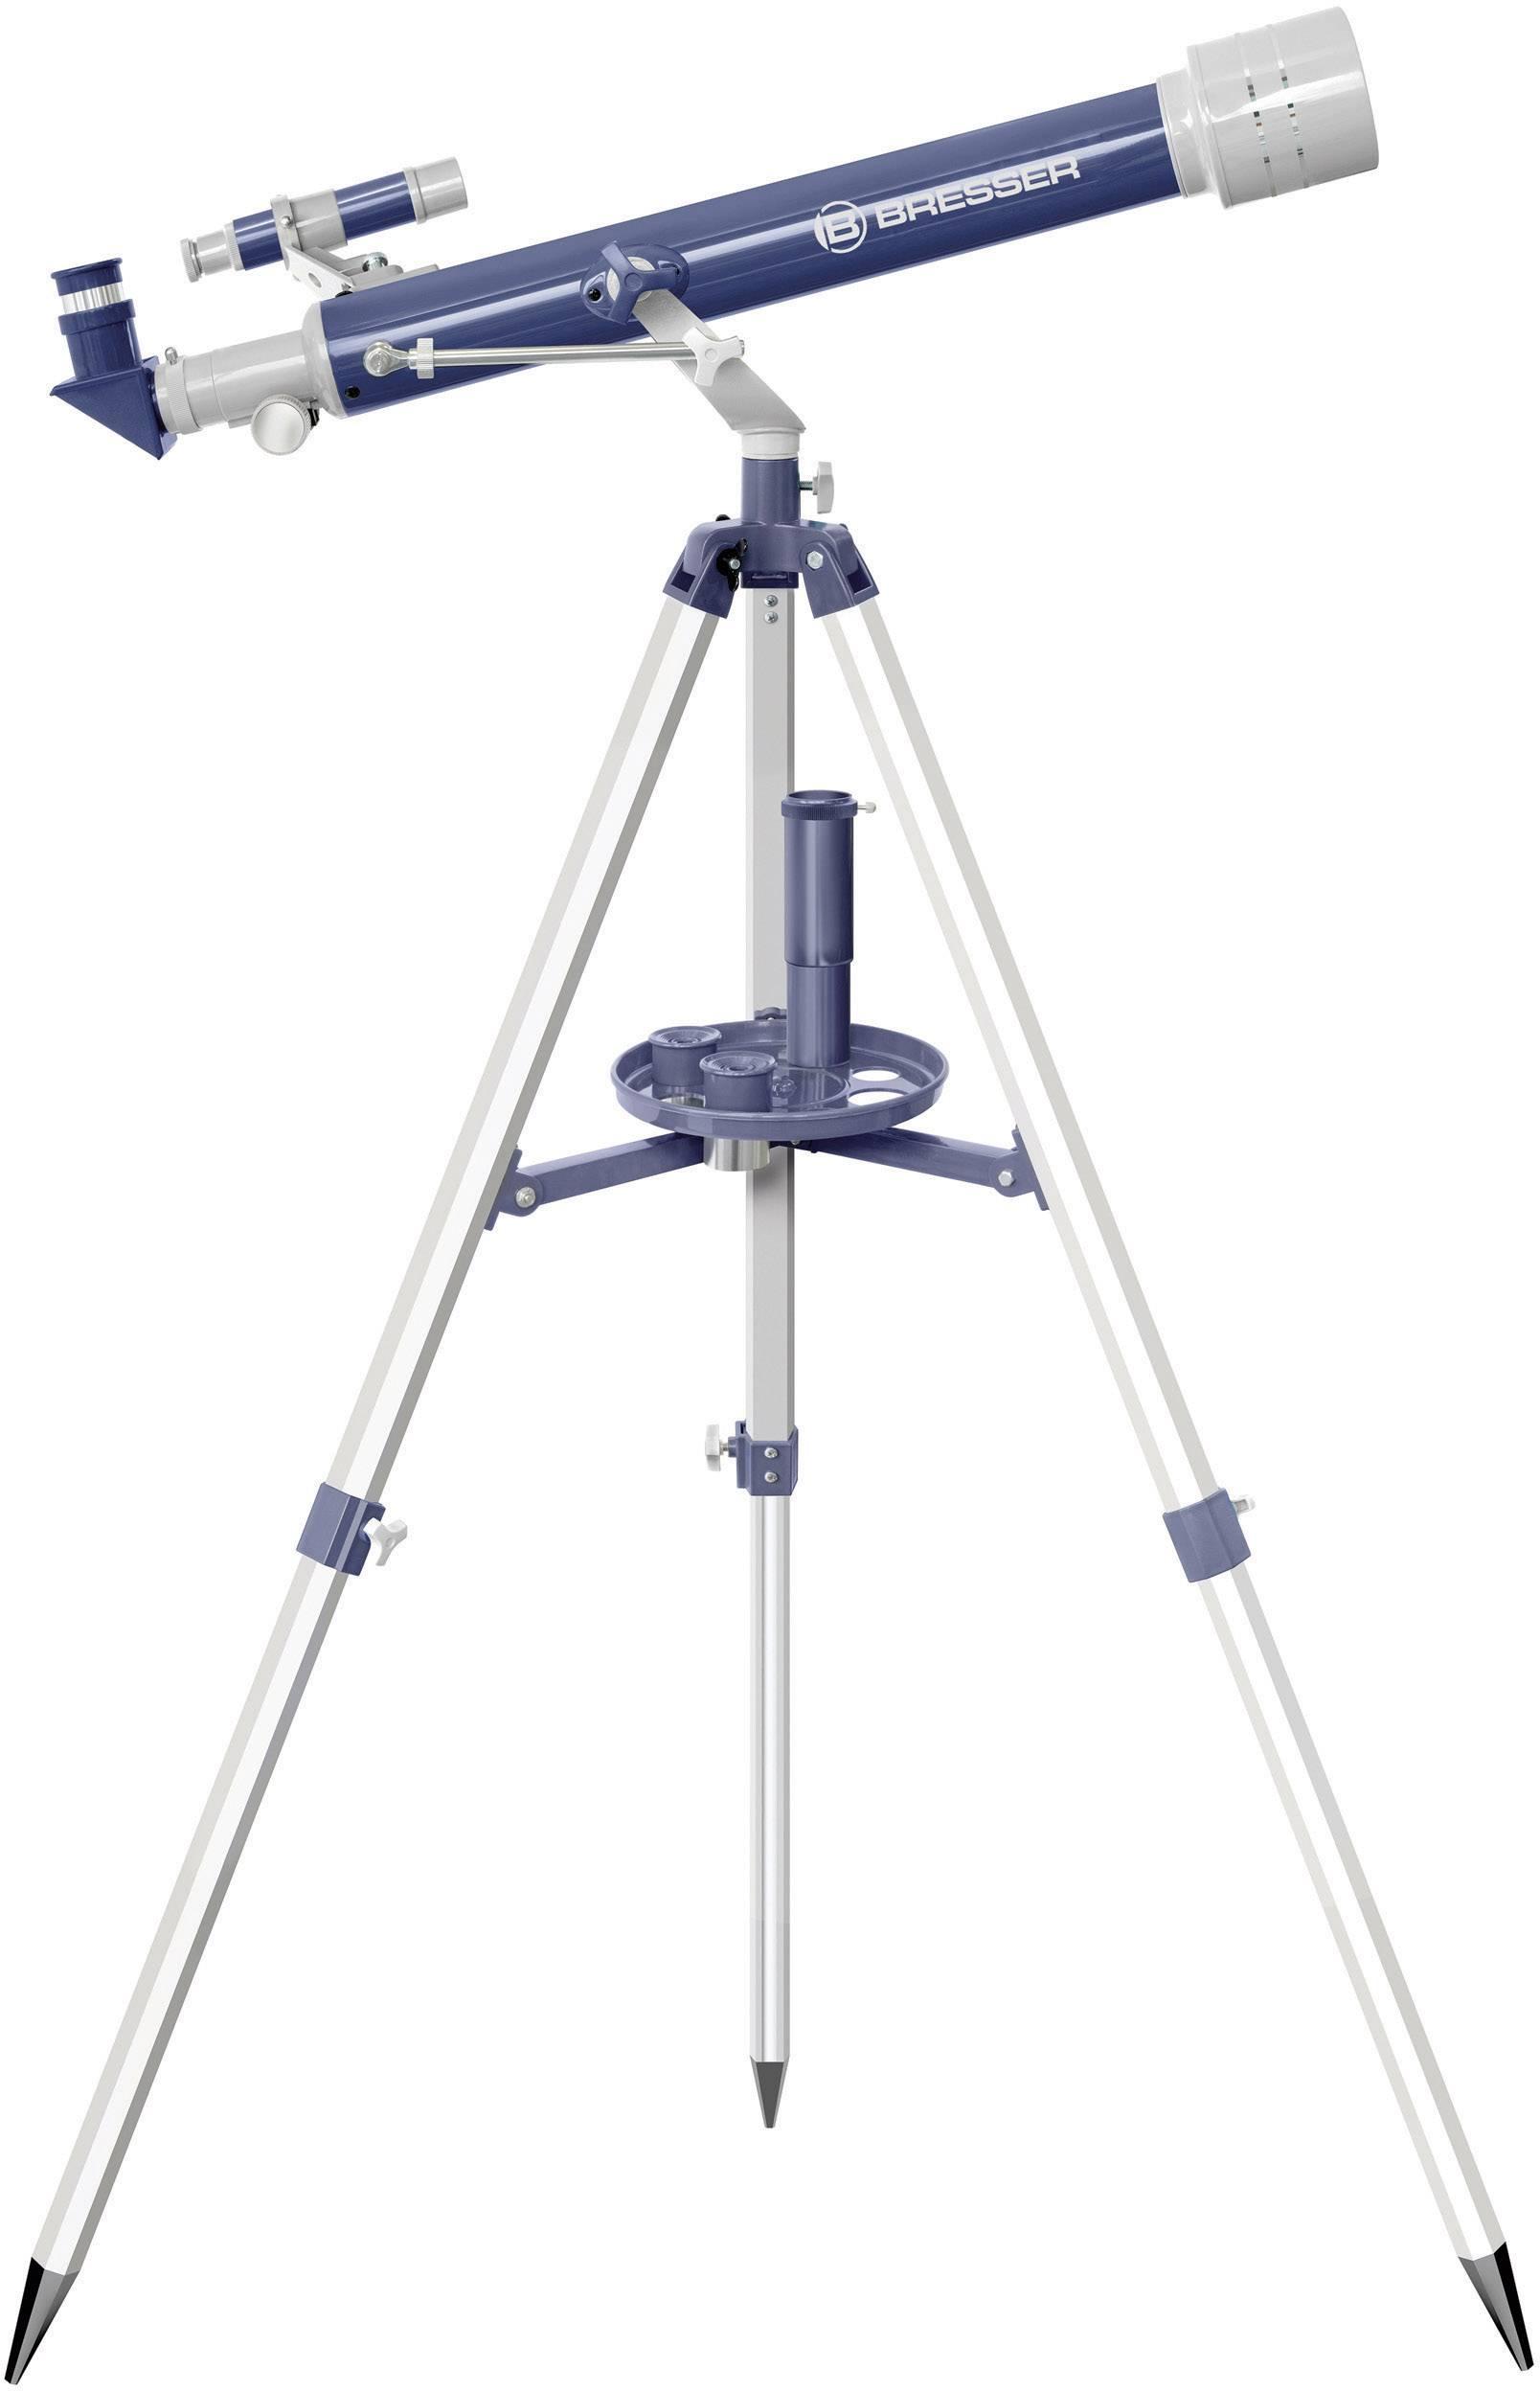 Teleskop Bresser Optik Visomar 60/700 AZ1 8843100, 35 až 175 x